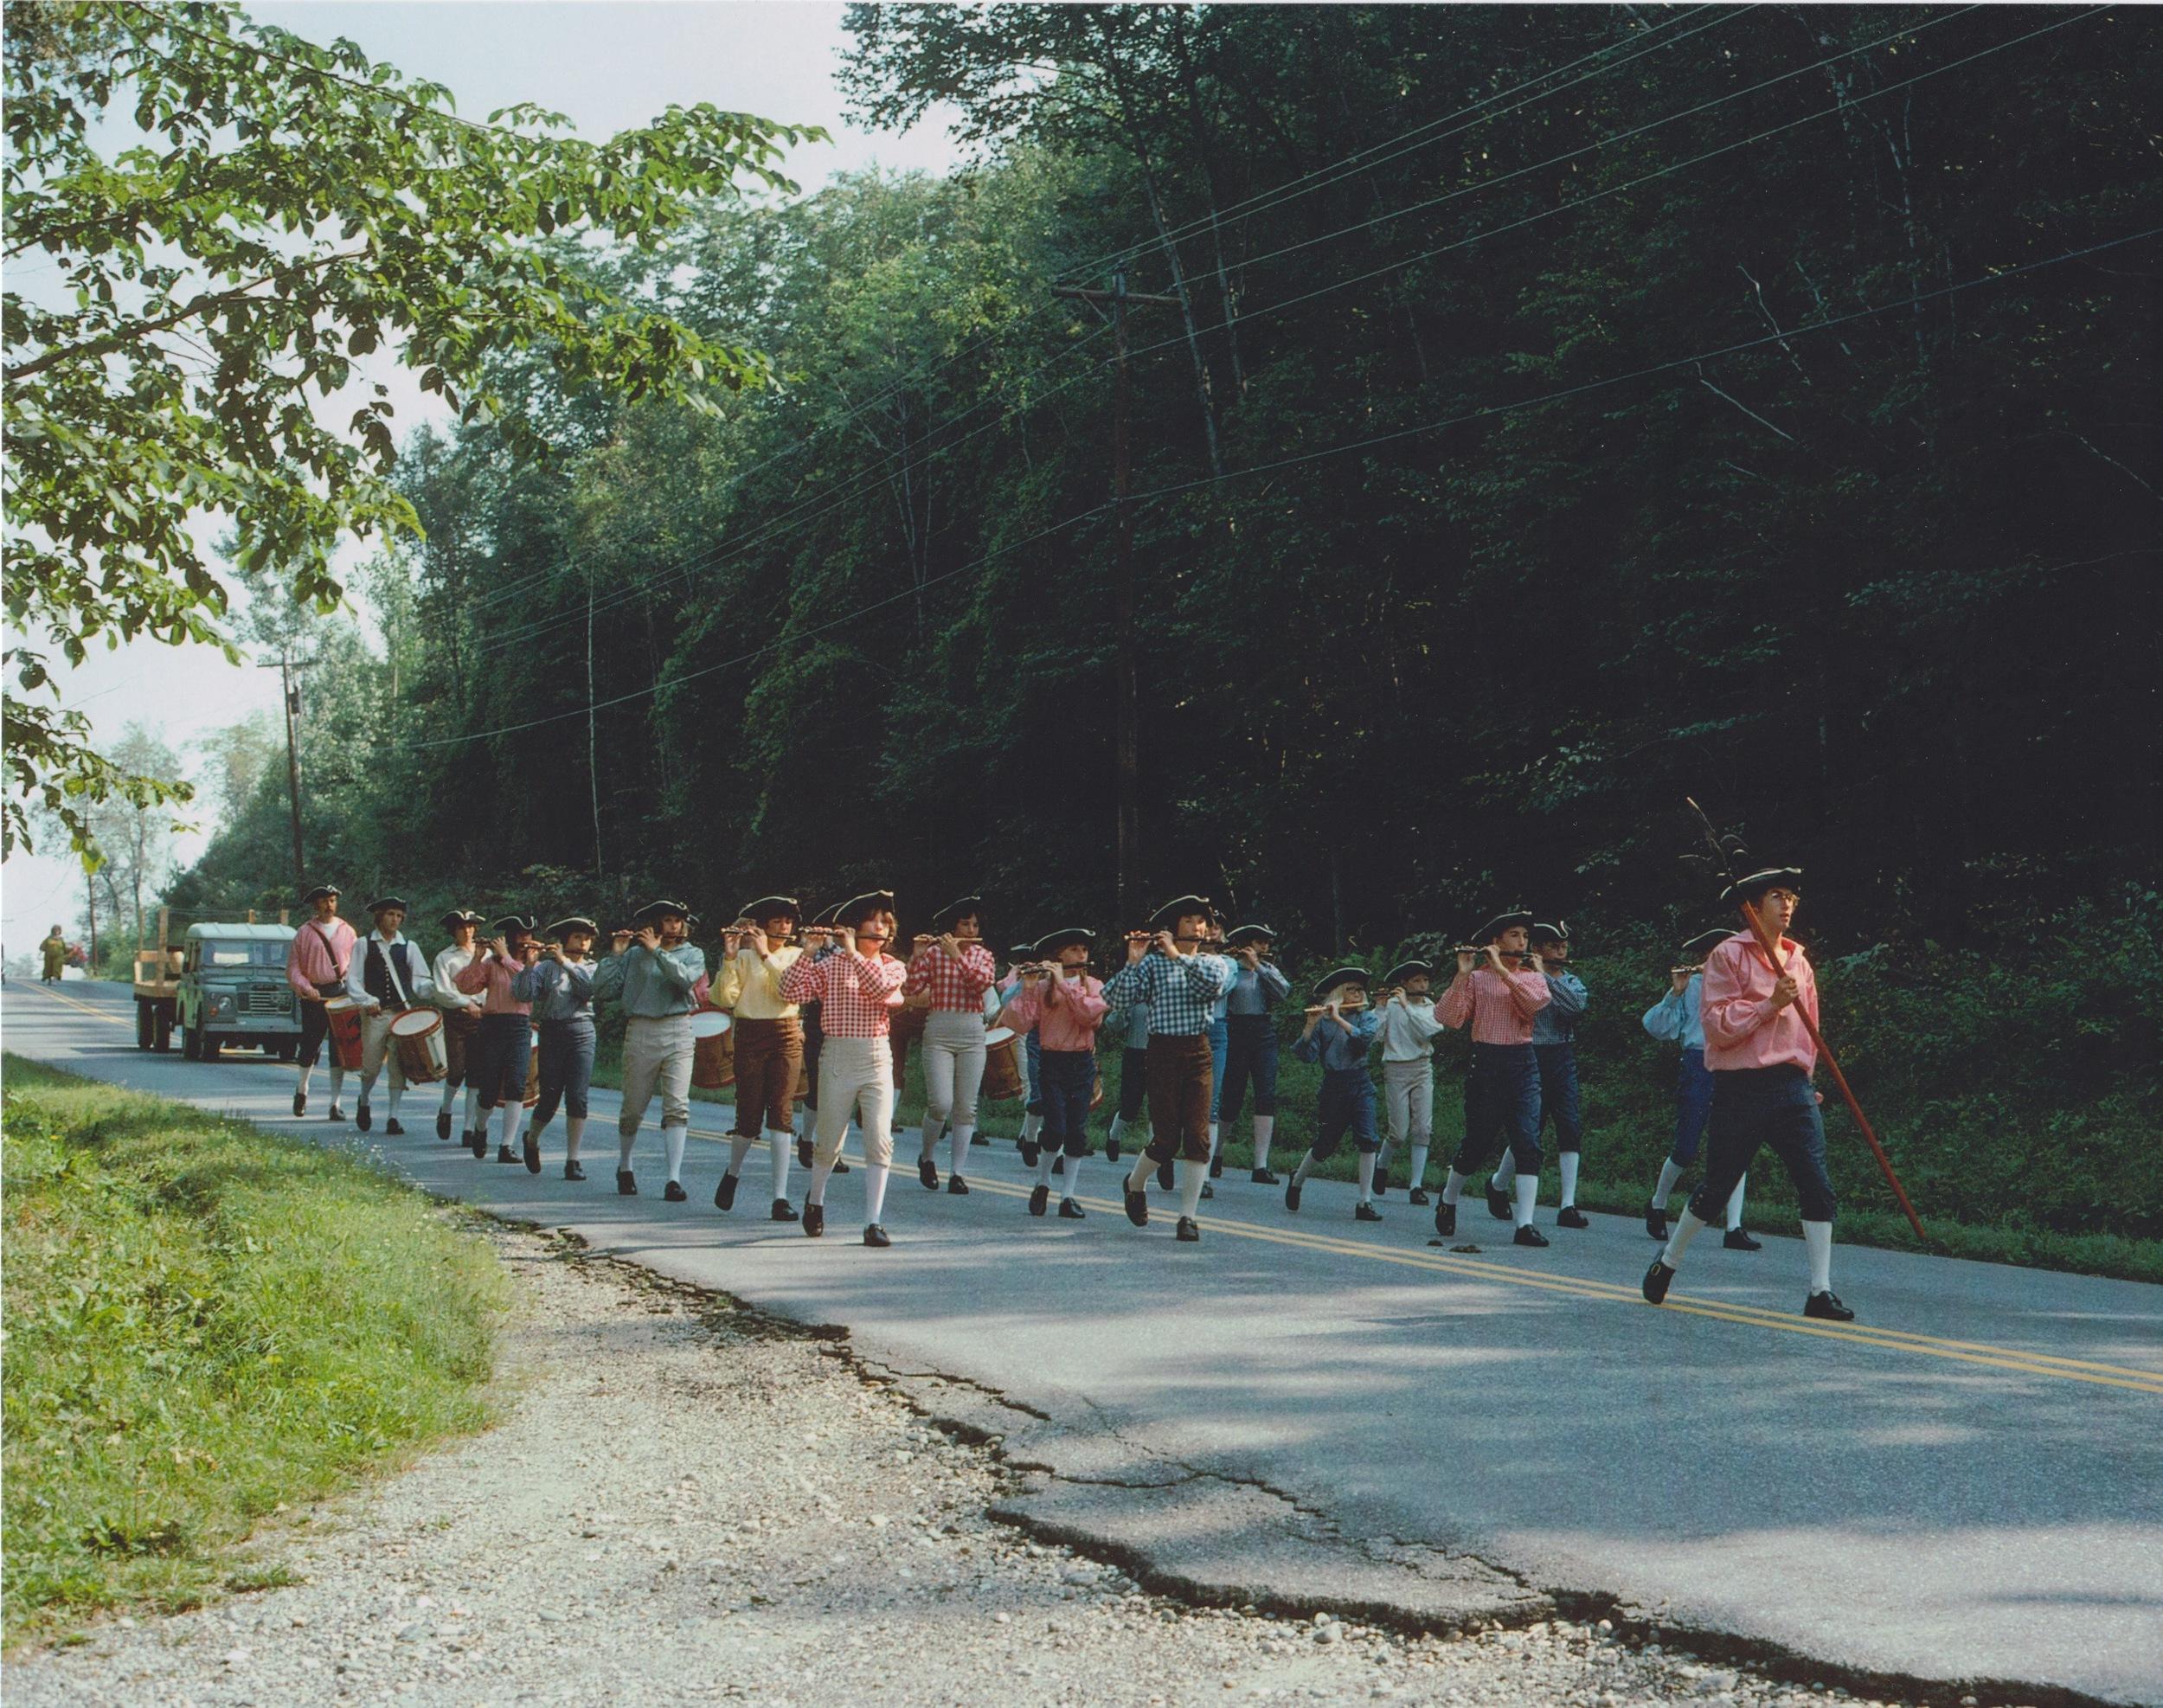 Parade in Monkton, VT - 1976